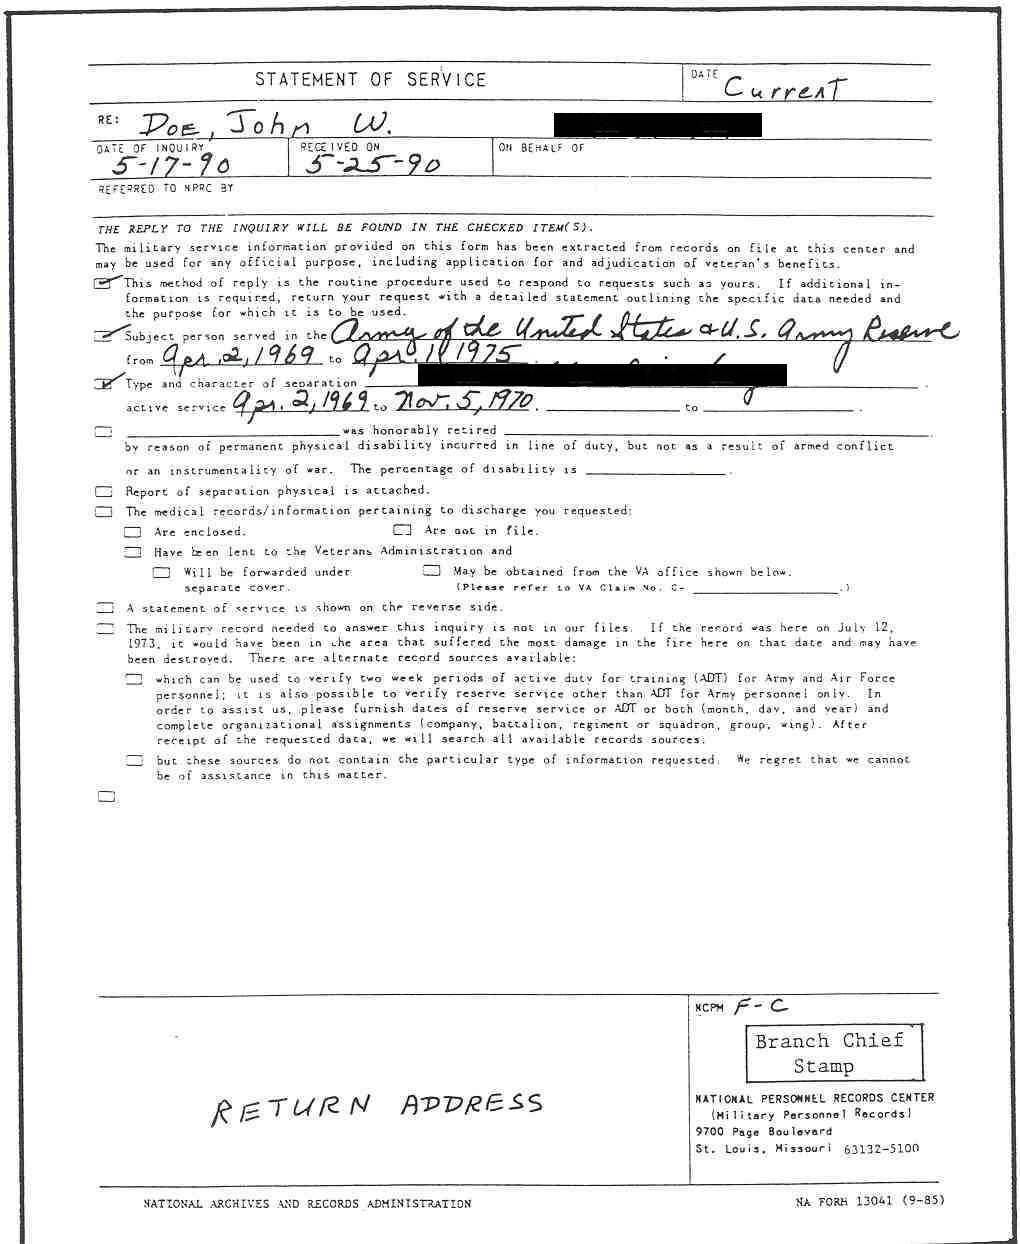 Figure 9: Sample completed NA Form 13041